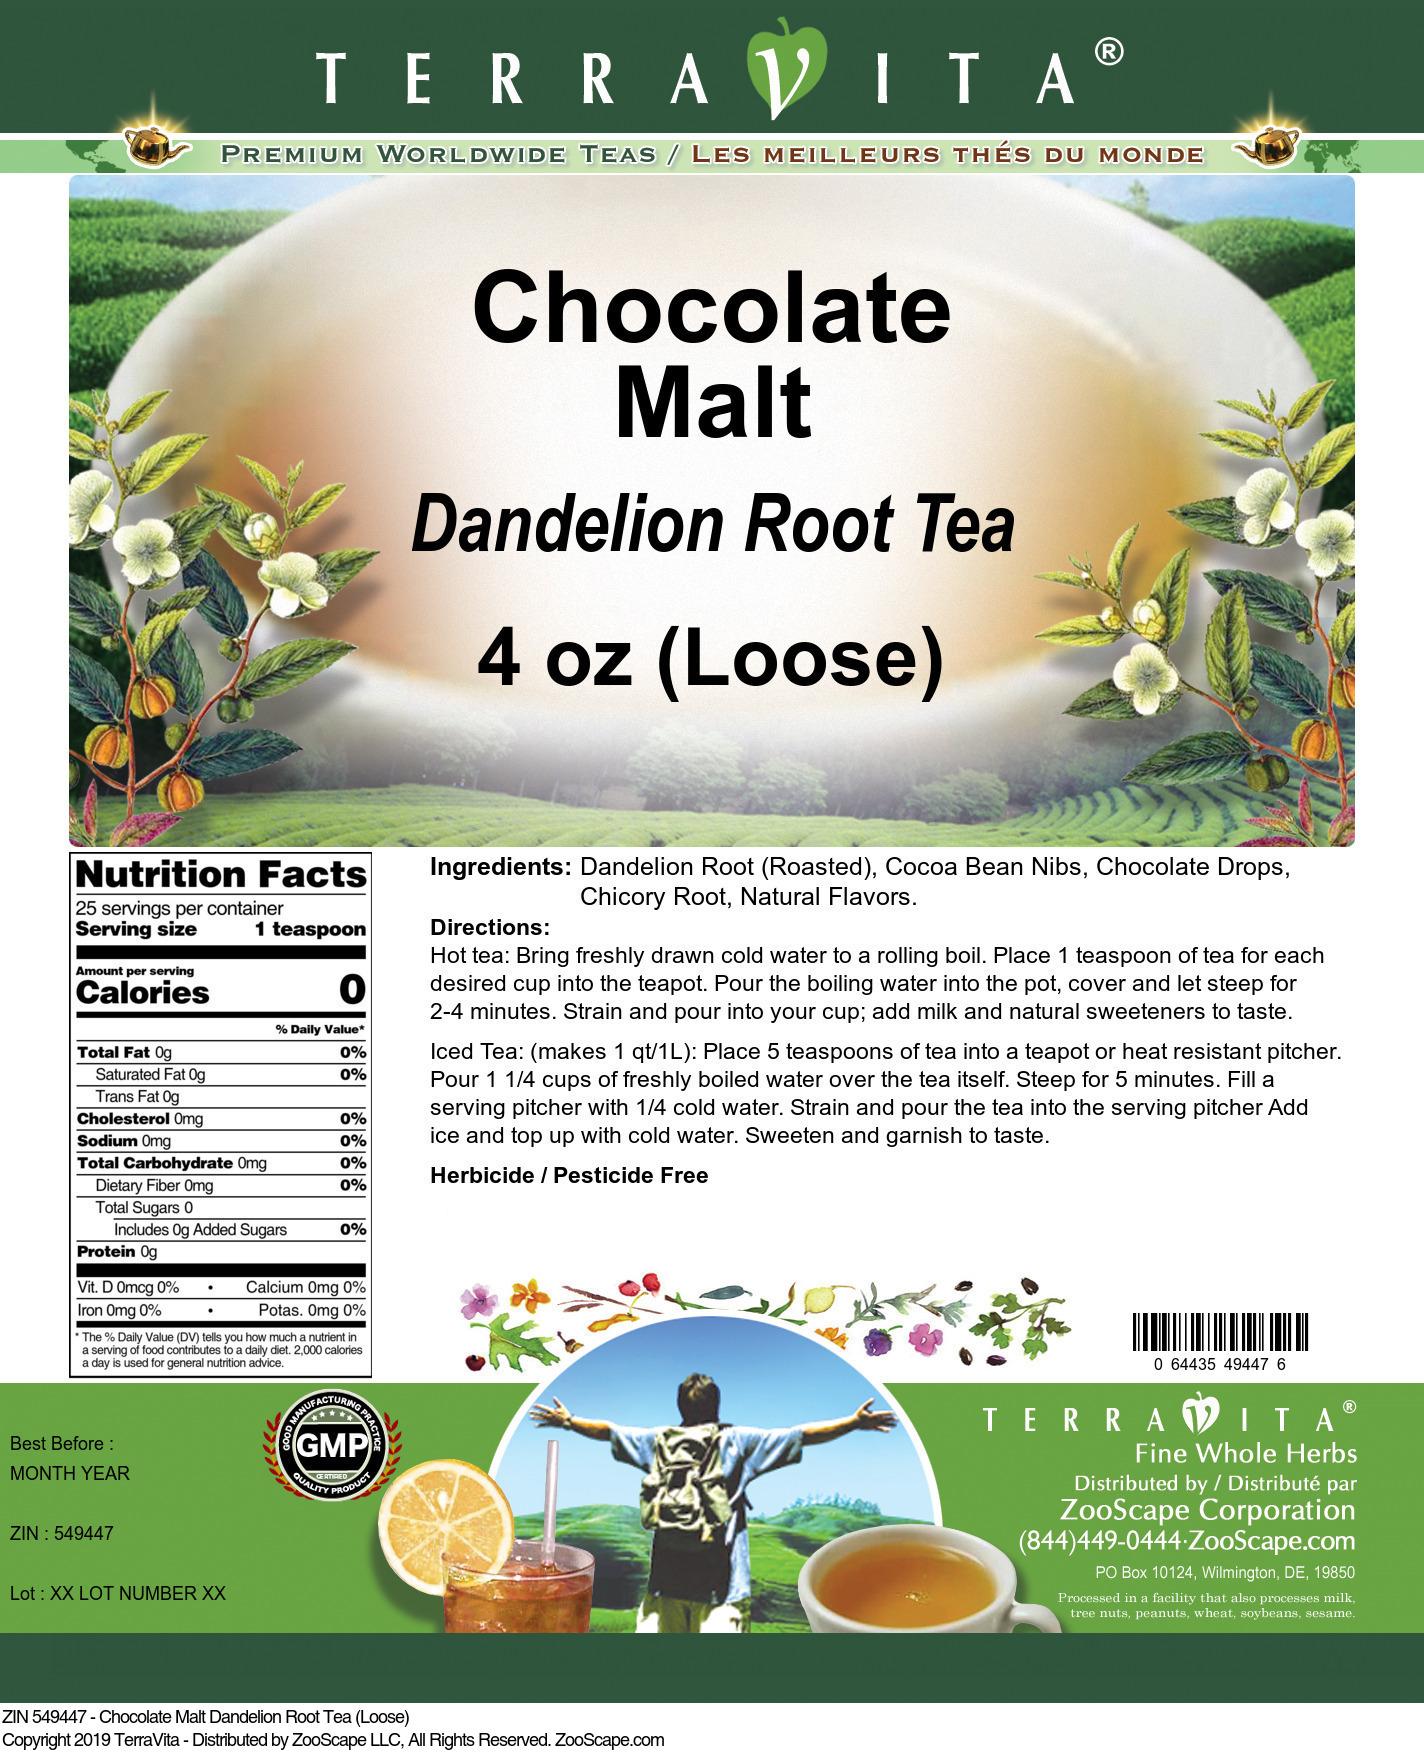 Chocolate Malt Dandelion Root